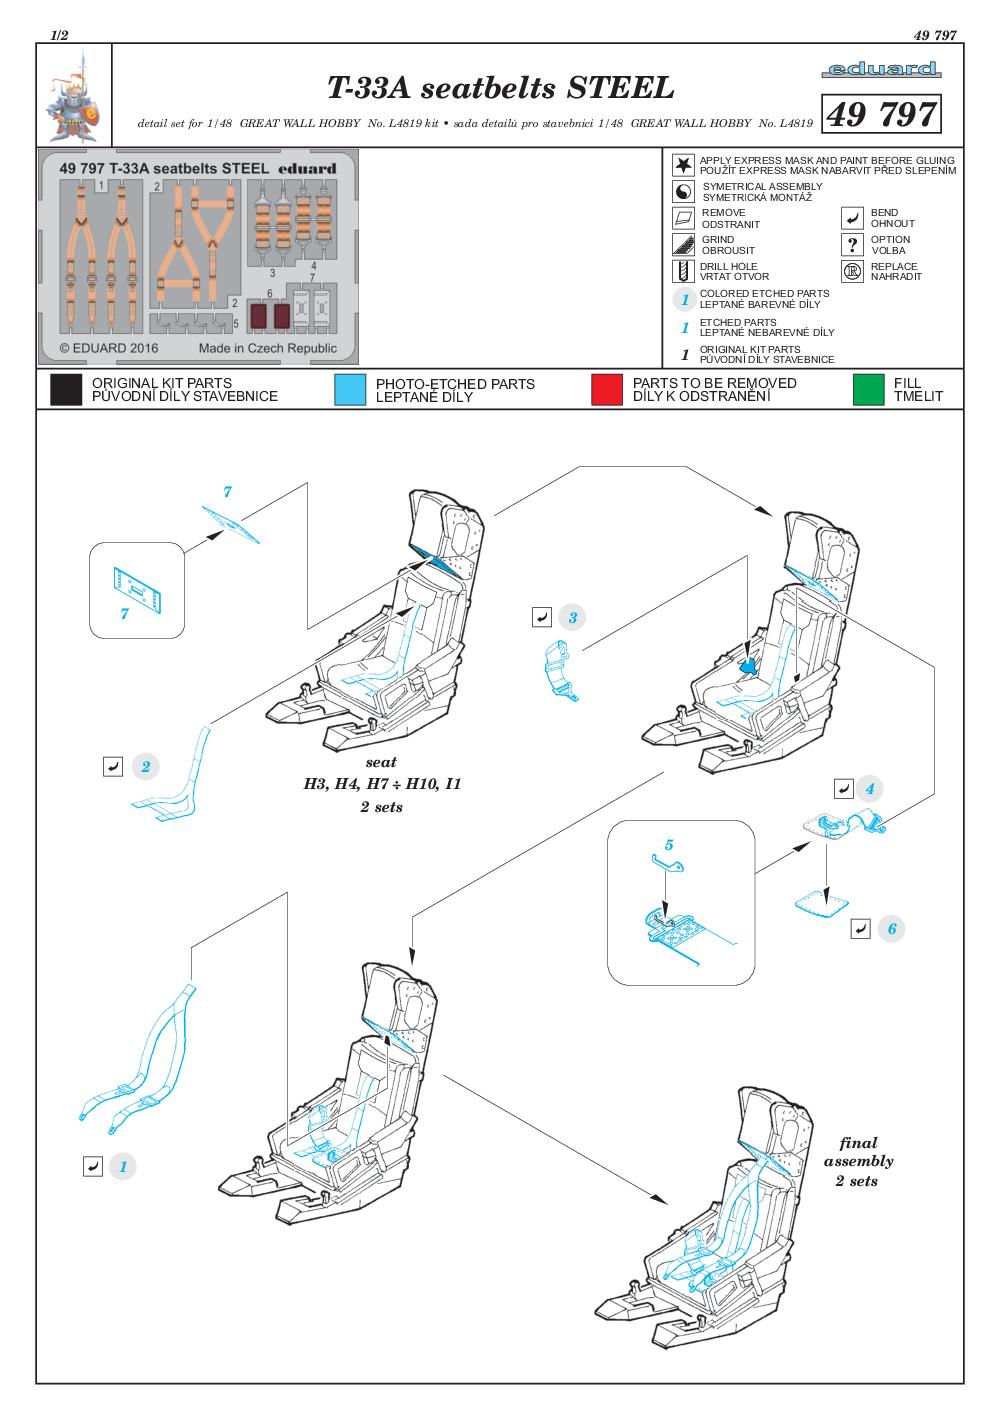 Eduard-49797-T-33A-Seatbelts-STEEL EDUARD Detailsets für die T-33A von GWH # 49796, FE 796 etc.